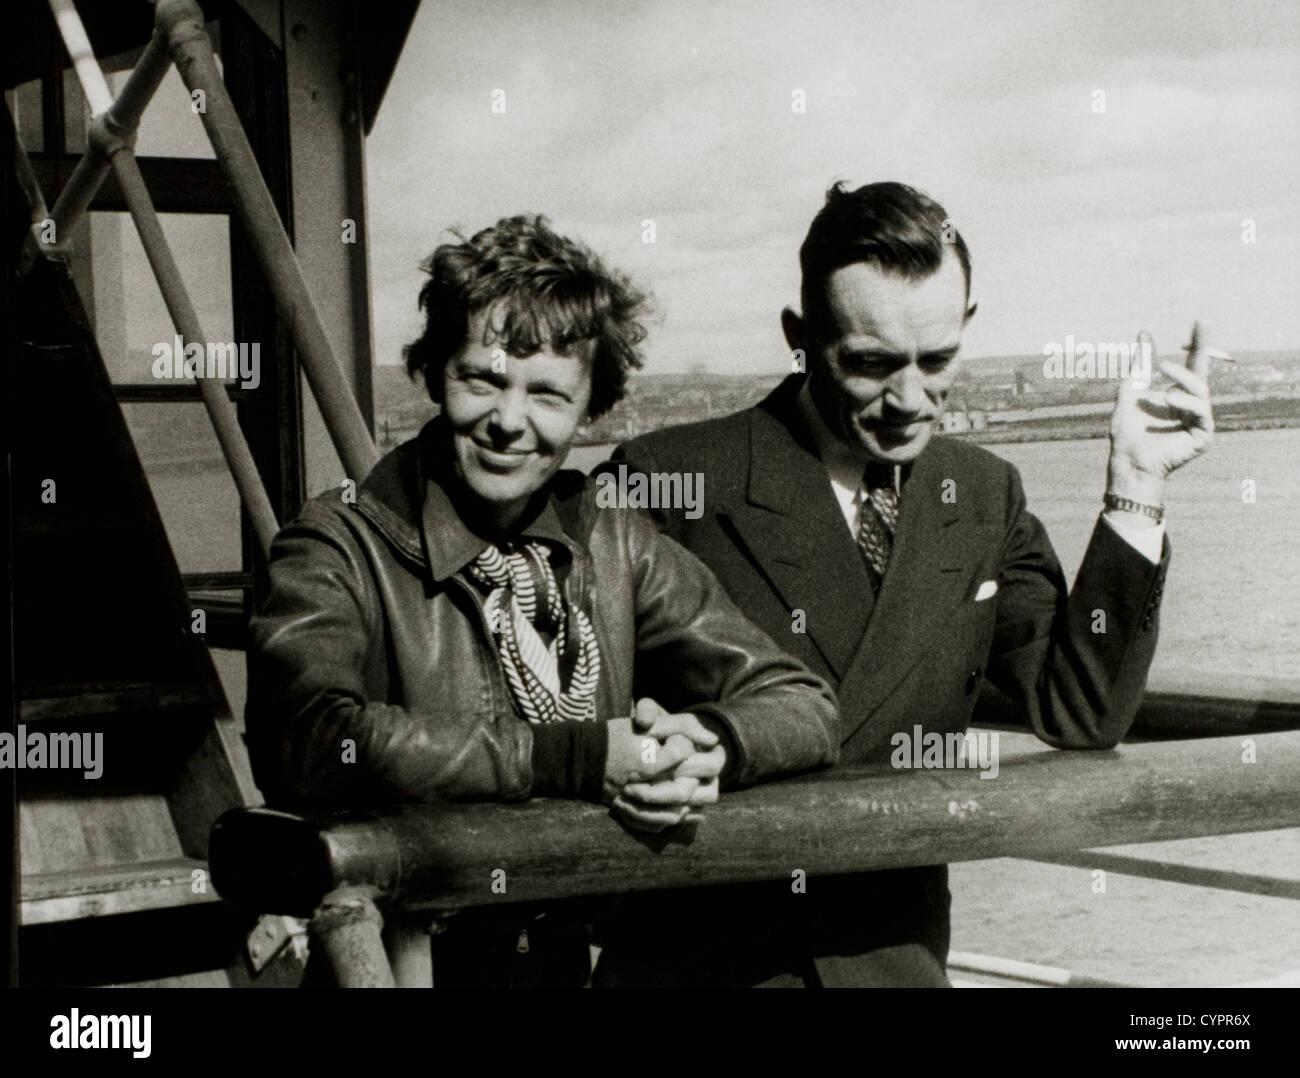 Amelia Earhart and Fred Noonan, Honolulu Airport, Hawaii, March 20, 1937 - Stock Image